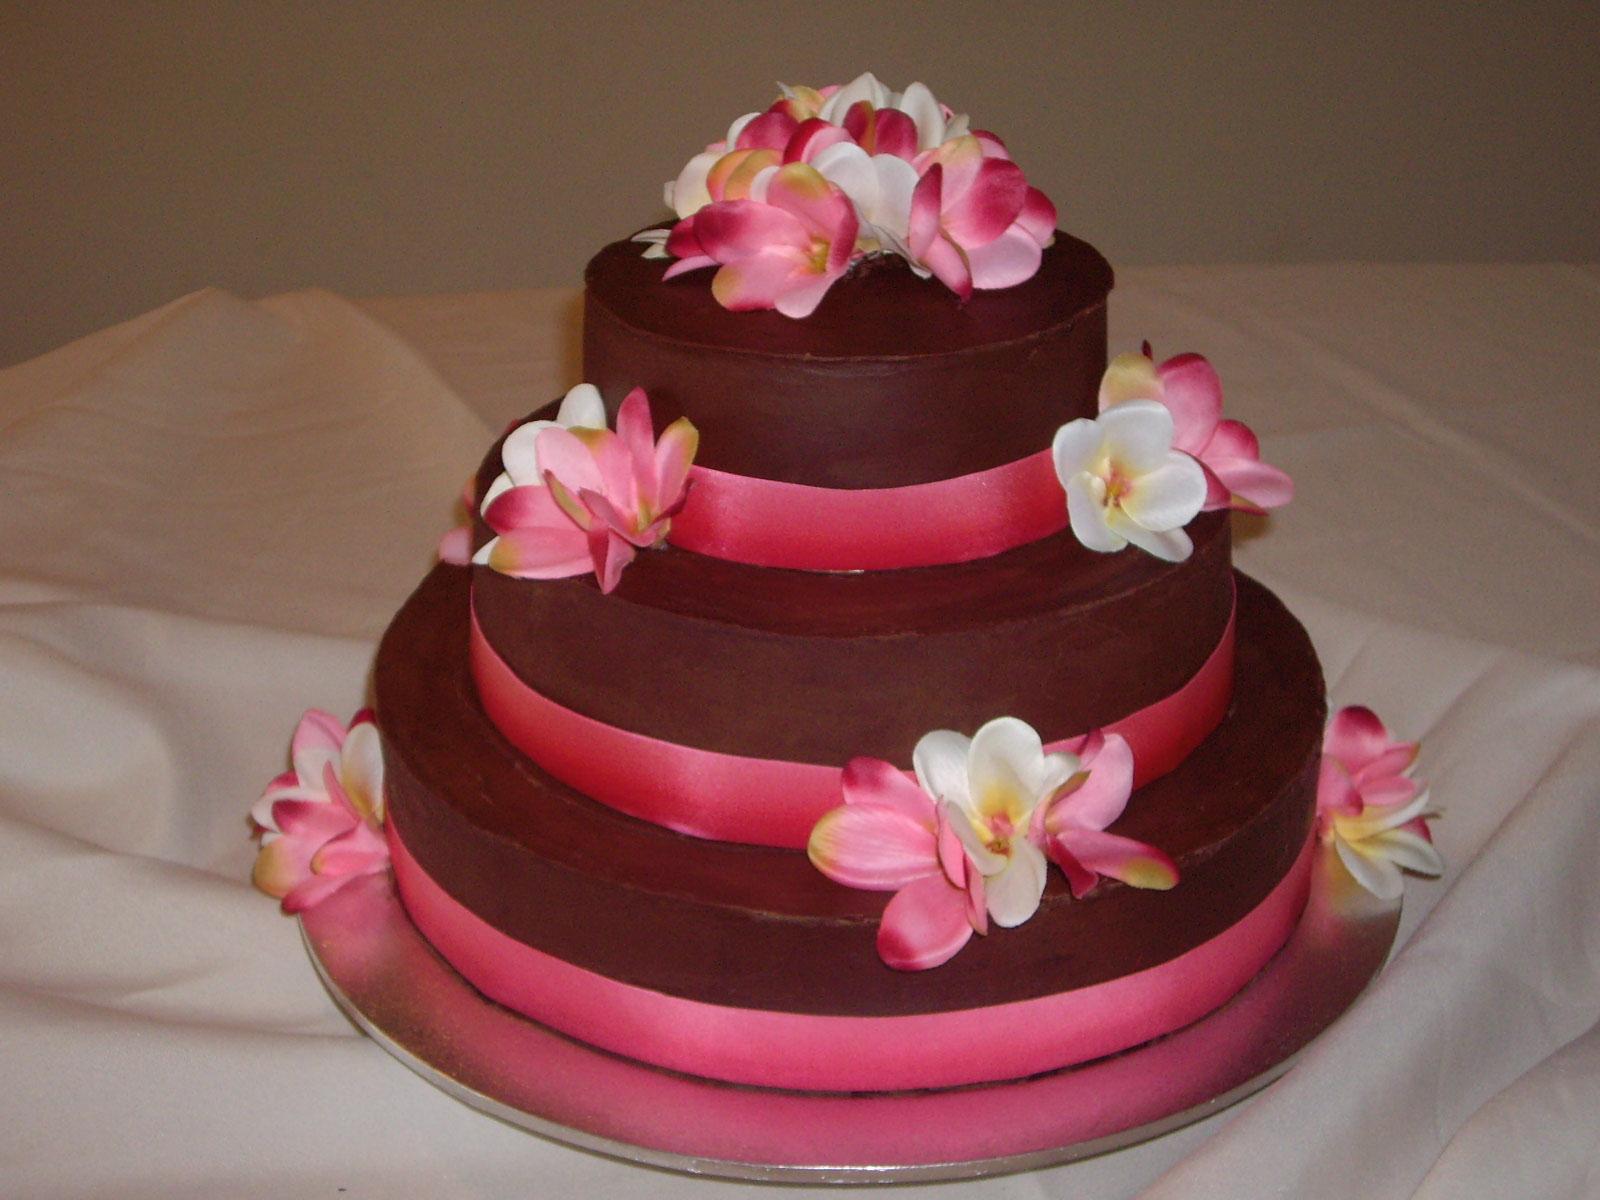 3-tier Choc Mud Wedding Cake